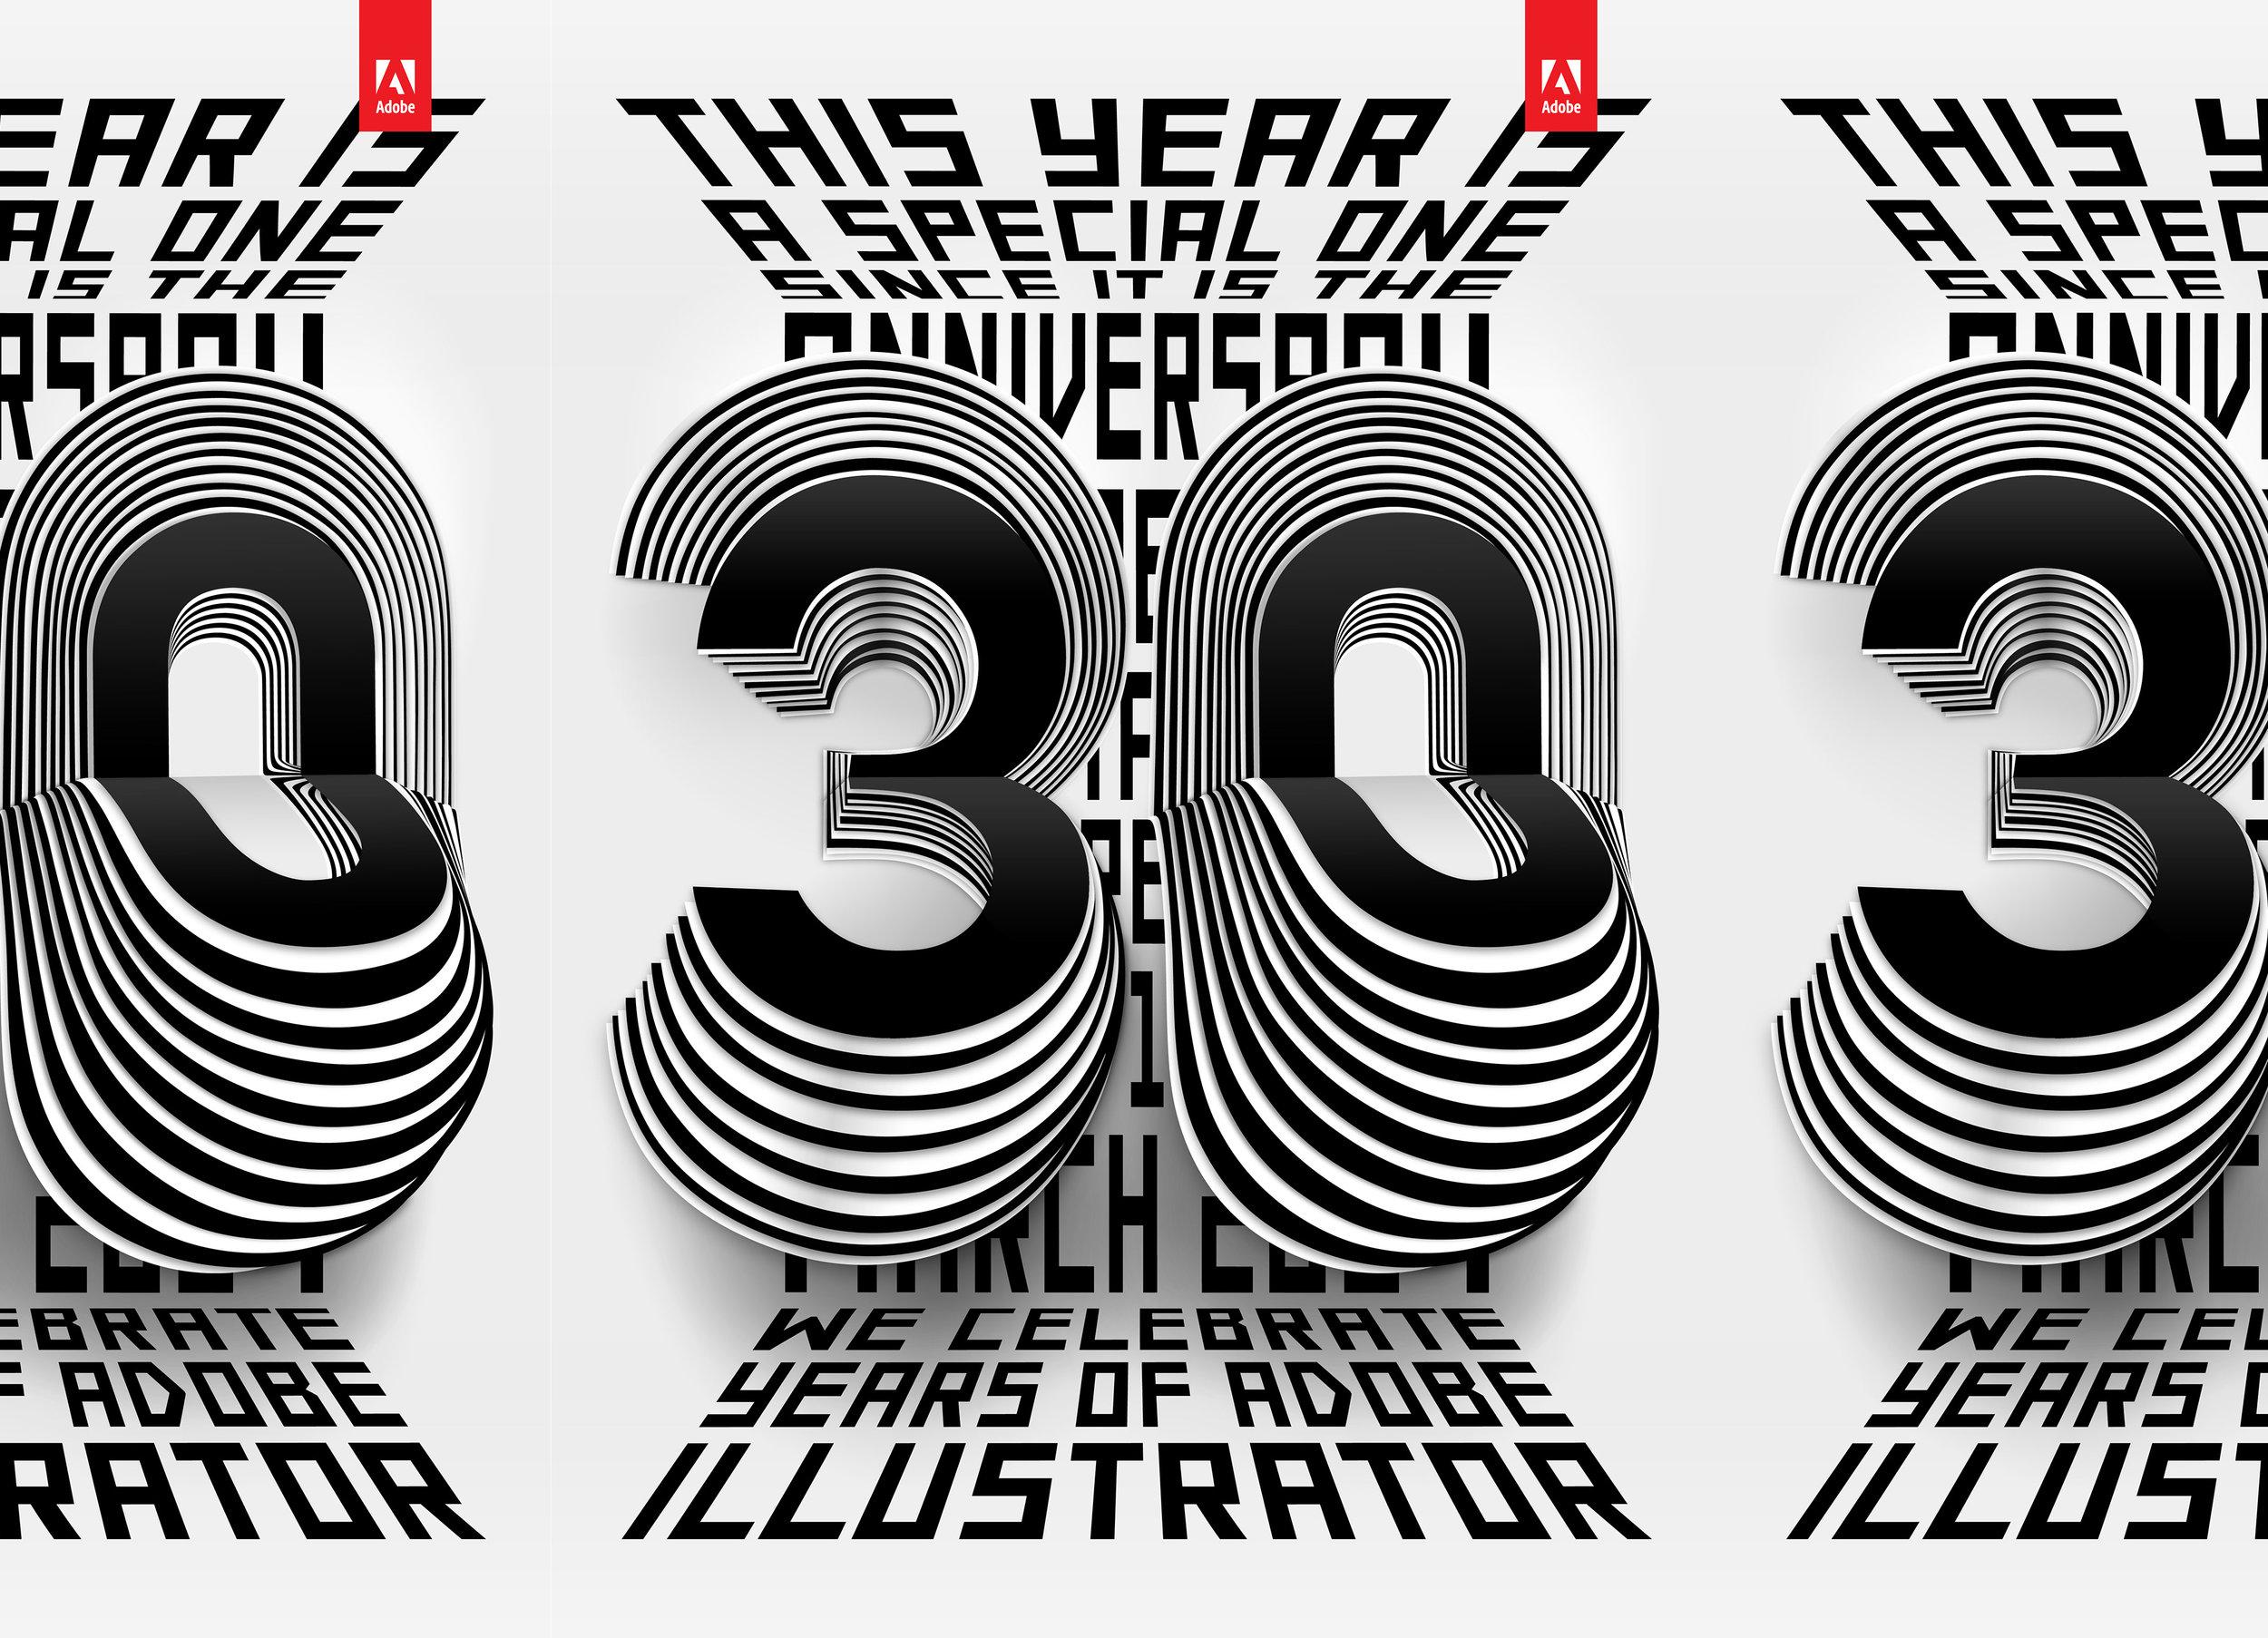 30 Years of Adobe Illustrator_picture 1.jpg